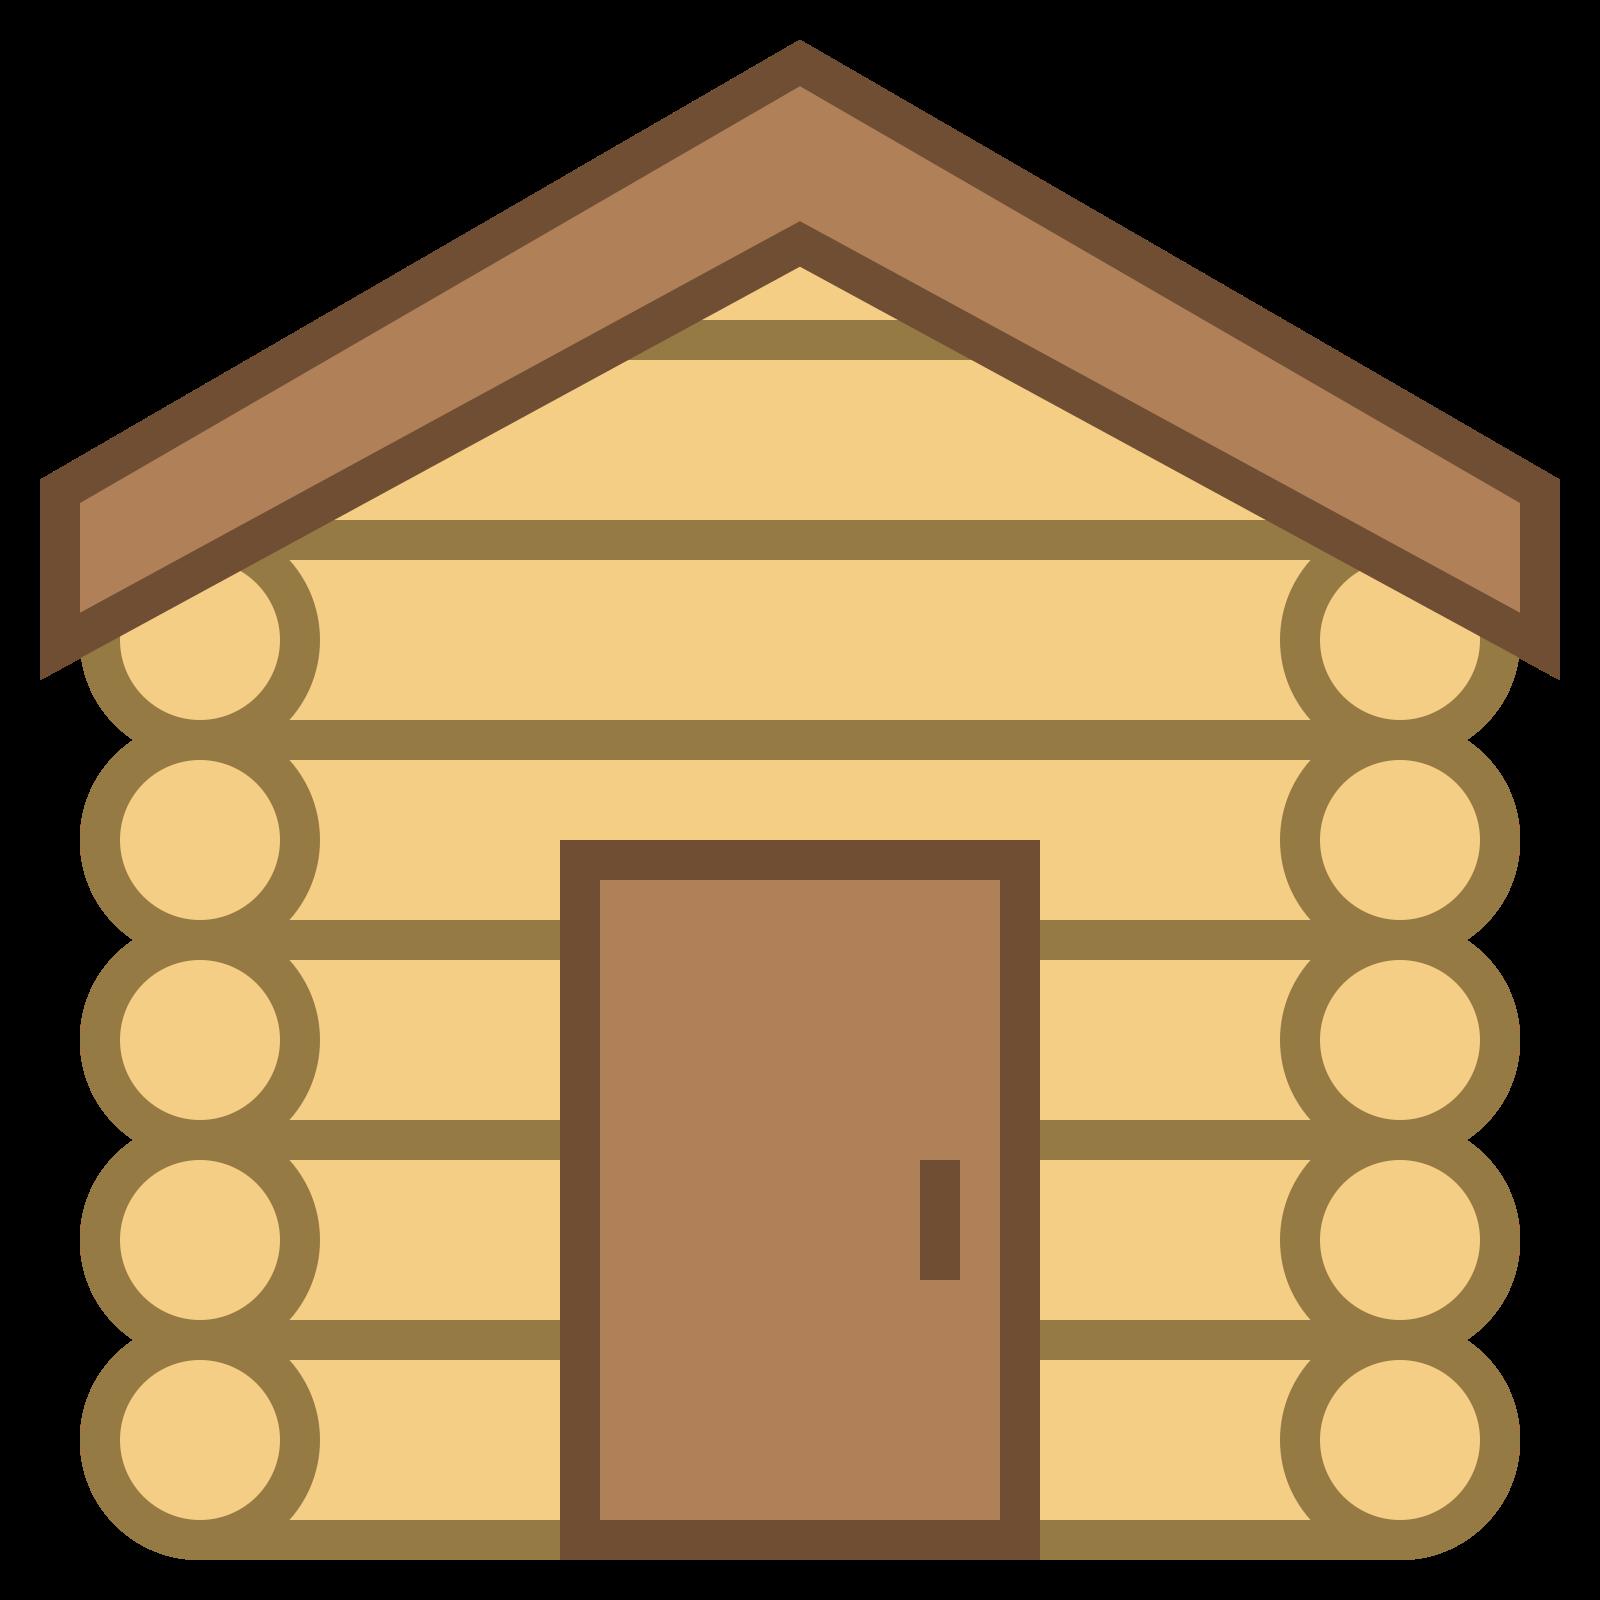 Domek icon